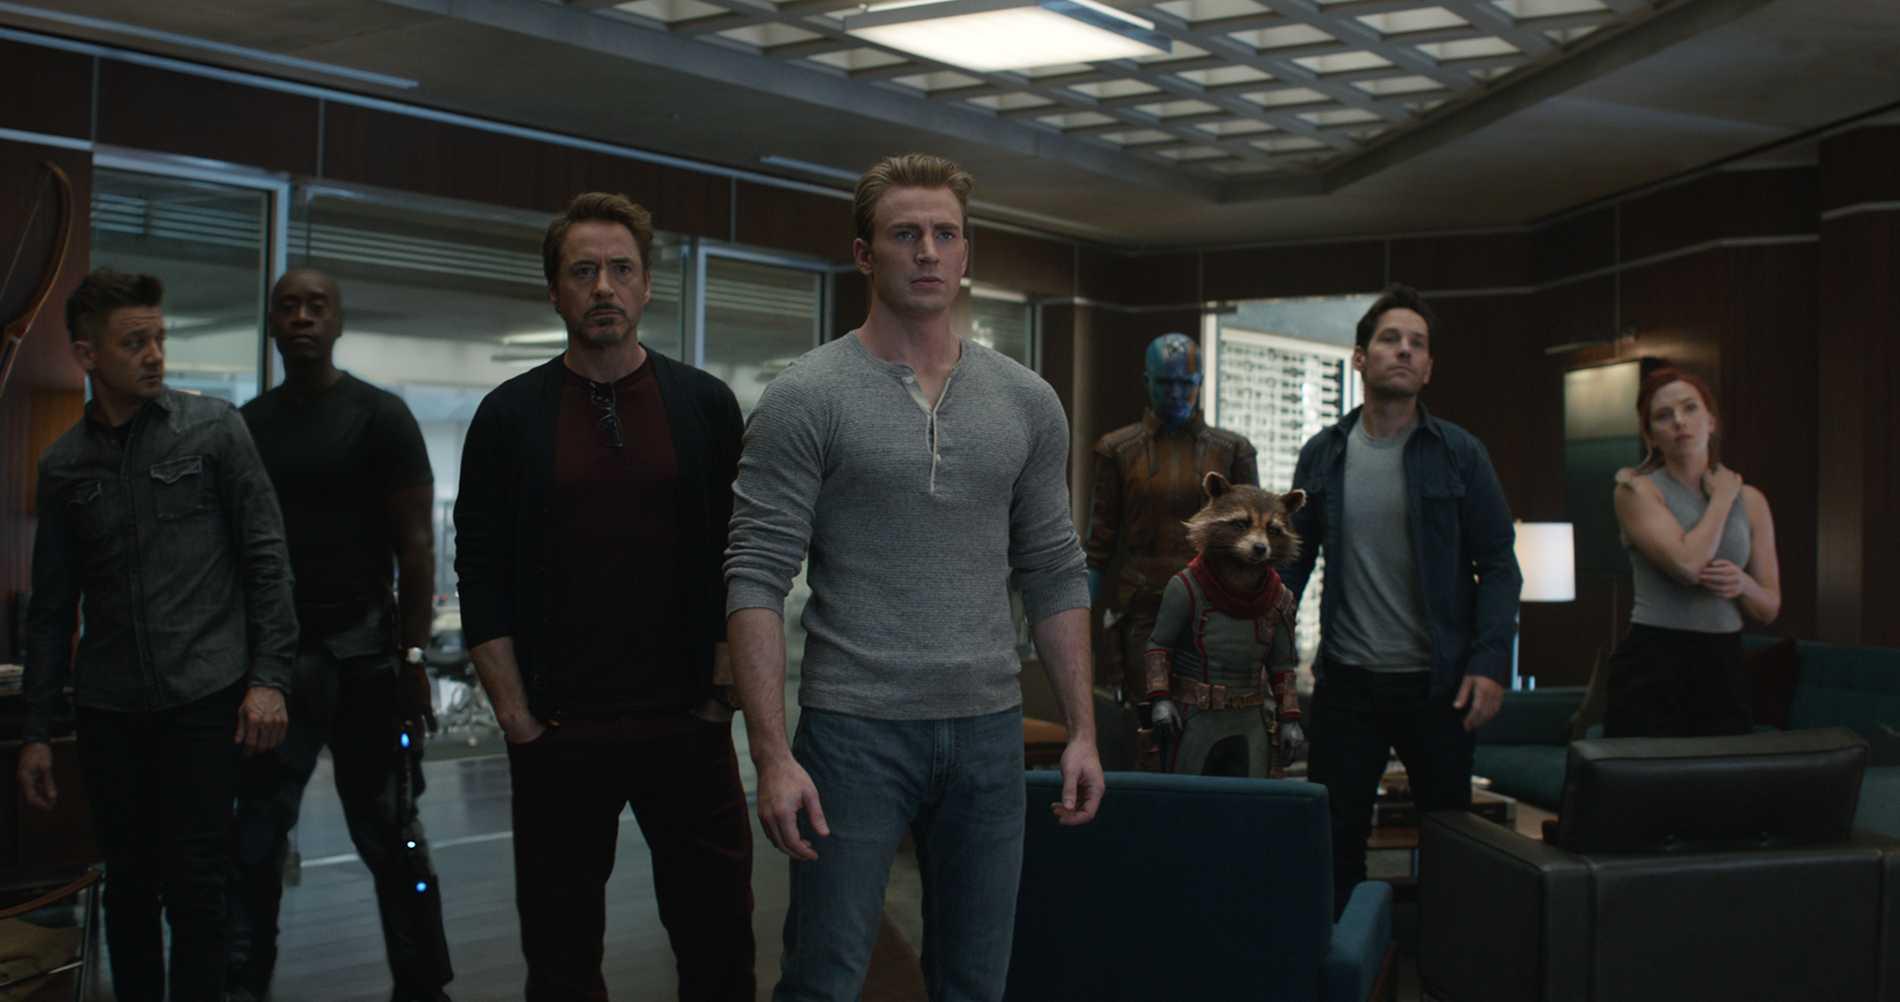 Jeremy Renner, Don Cheadle, Robert Downey jr, Chris Evans, Karen Gillan, Rocket, Paul Rudd och Scarlett Johansson.